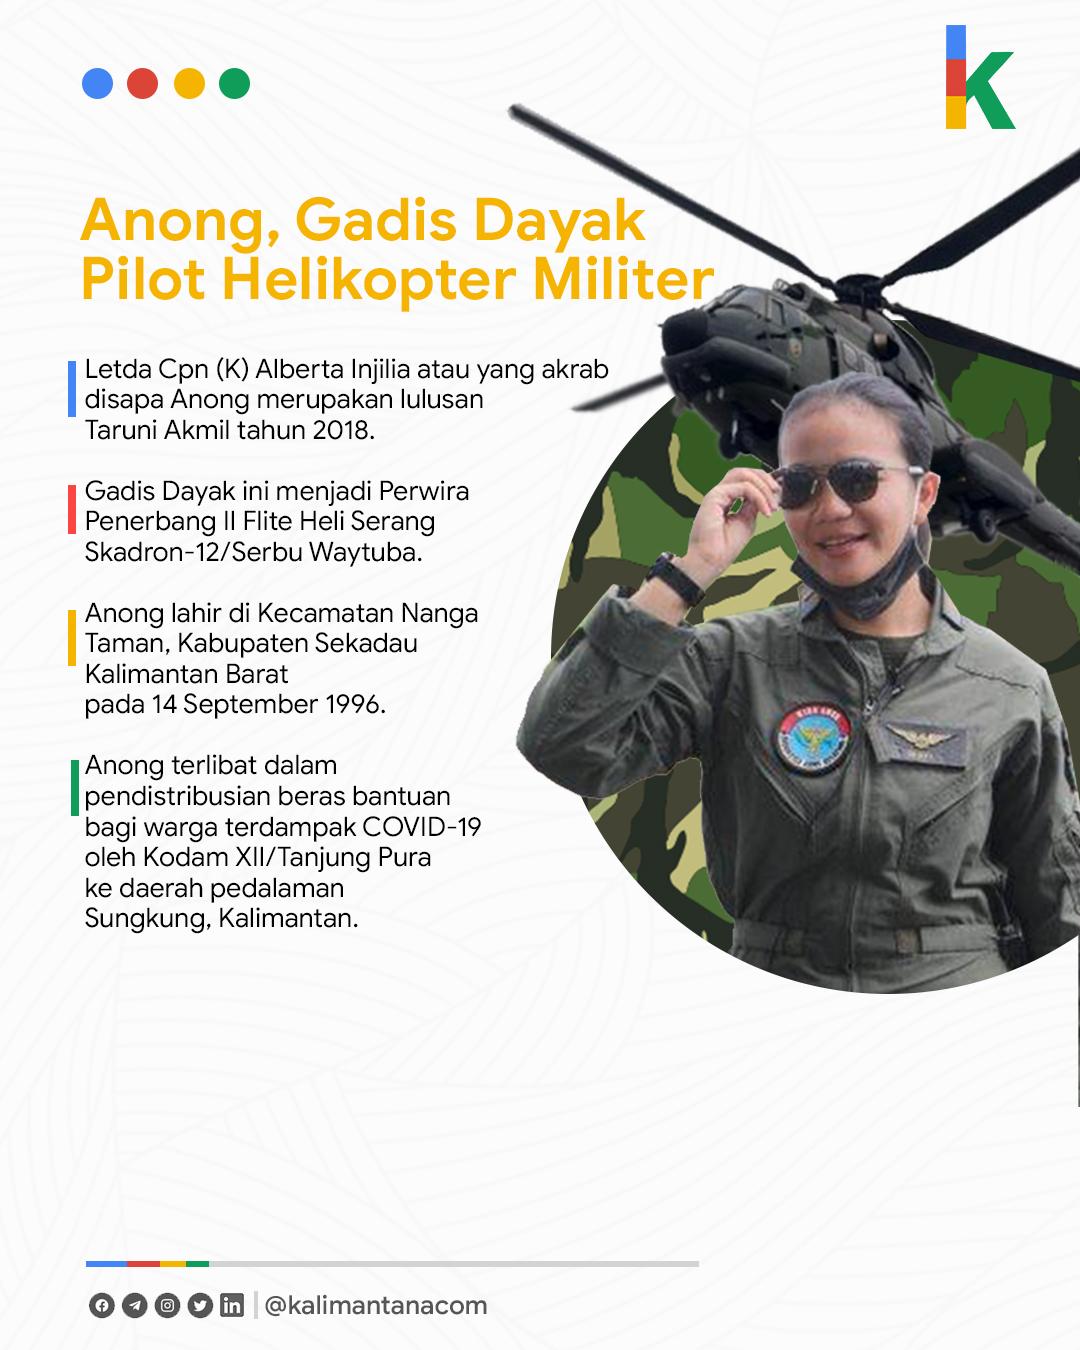 Anong, Gadis Dayak yang Menjadi Pilot Helikopter